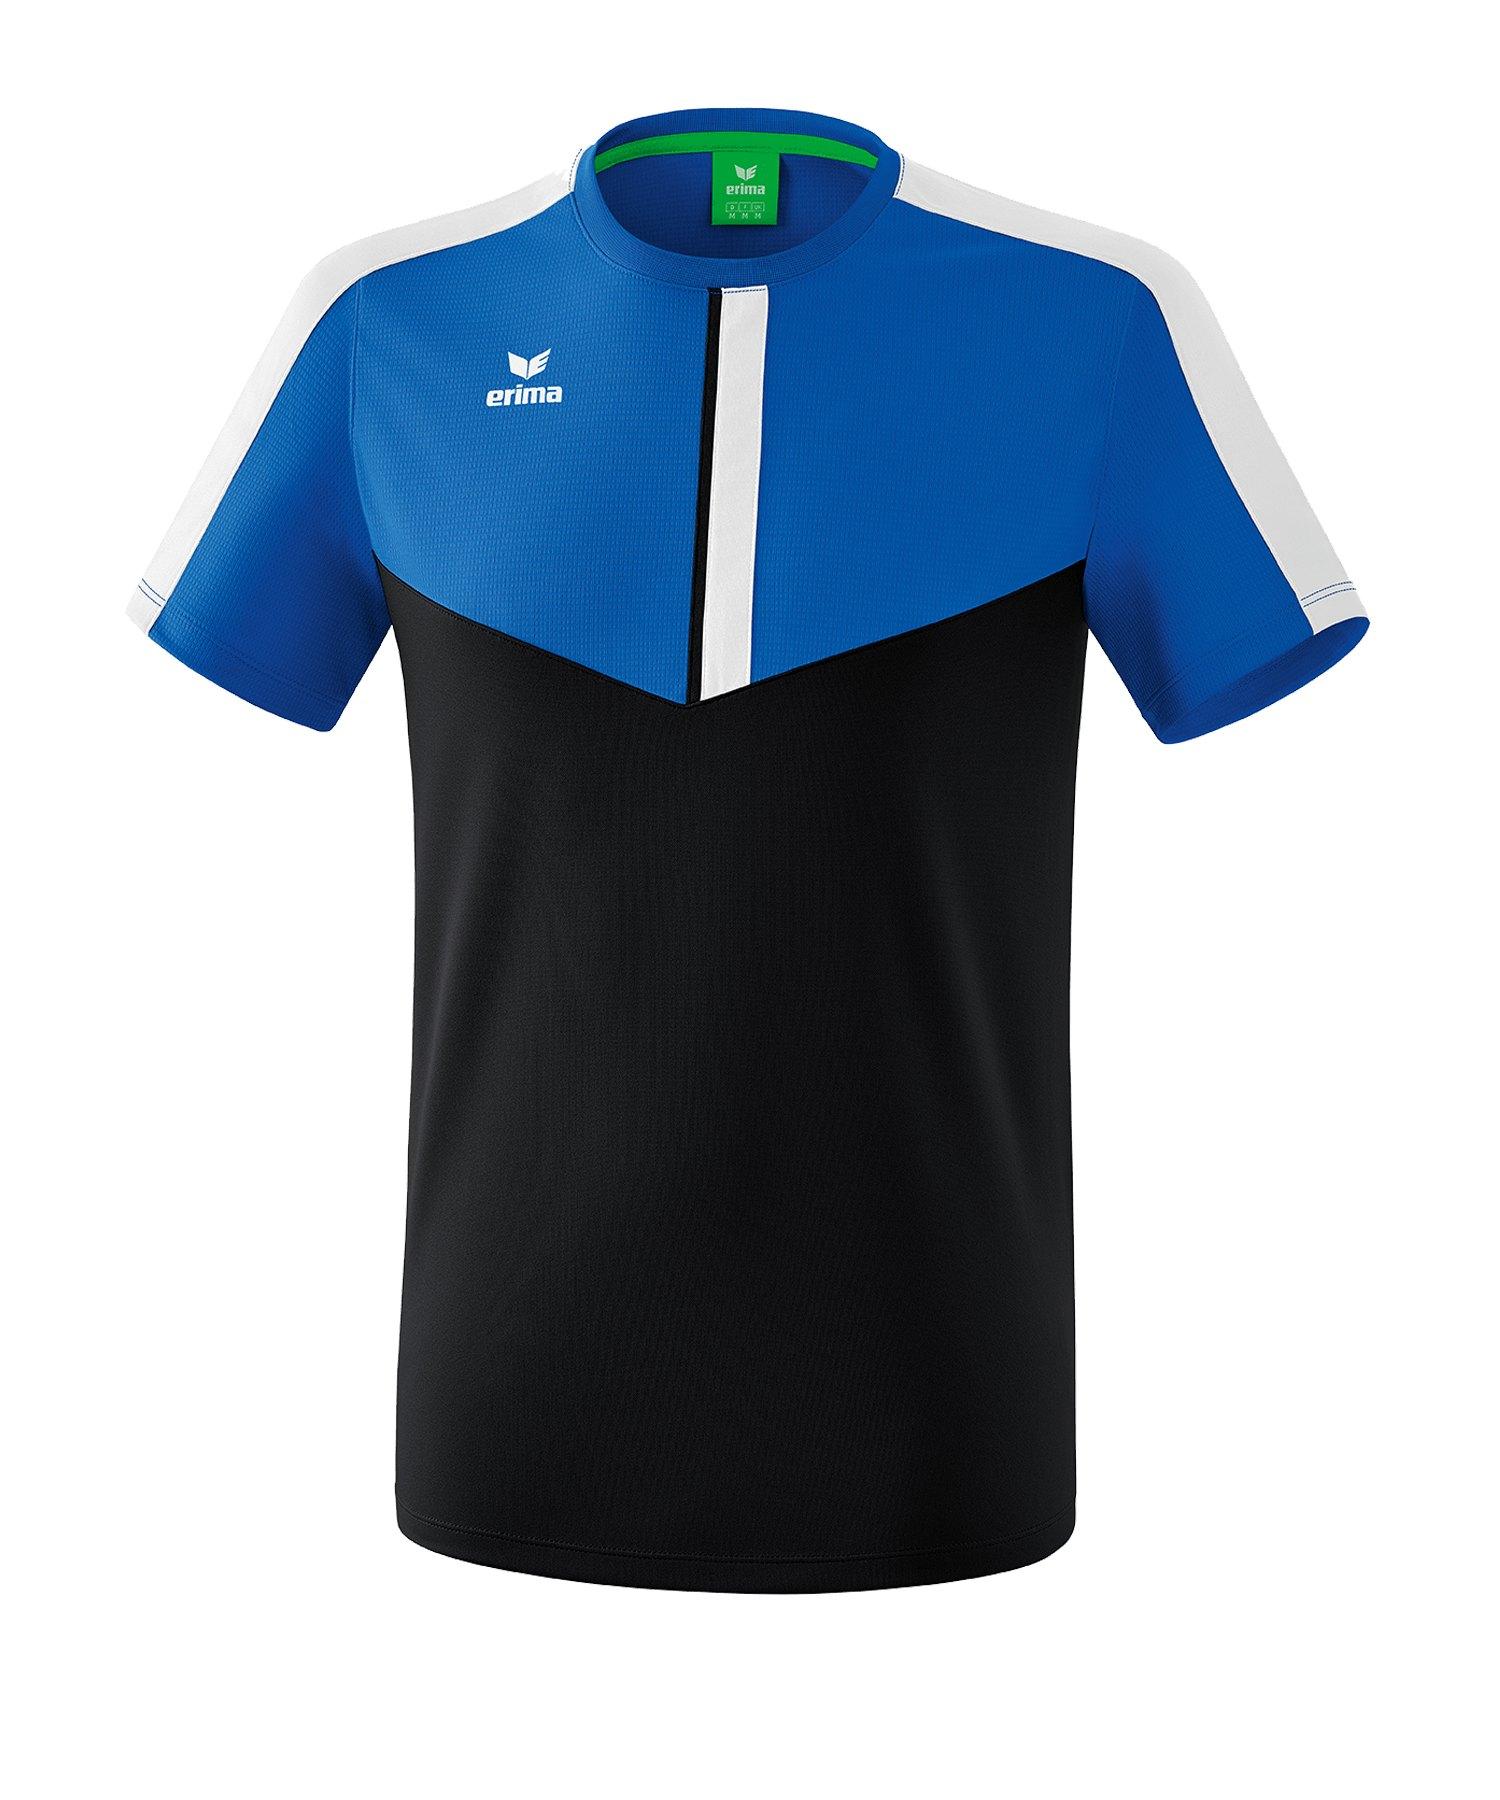 Erima Squad T-Shirt Blau Schwarz - blau